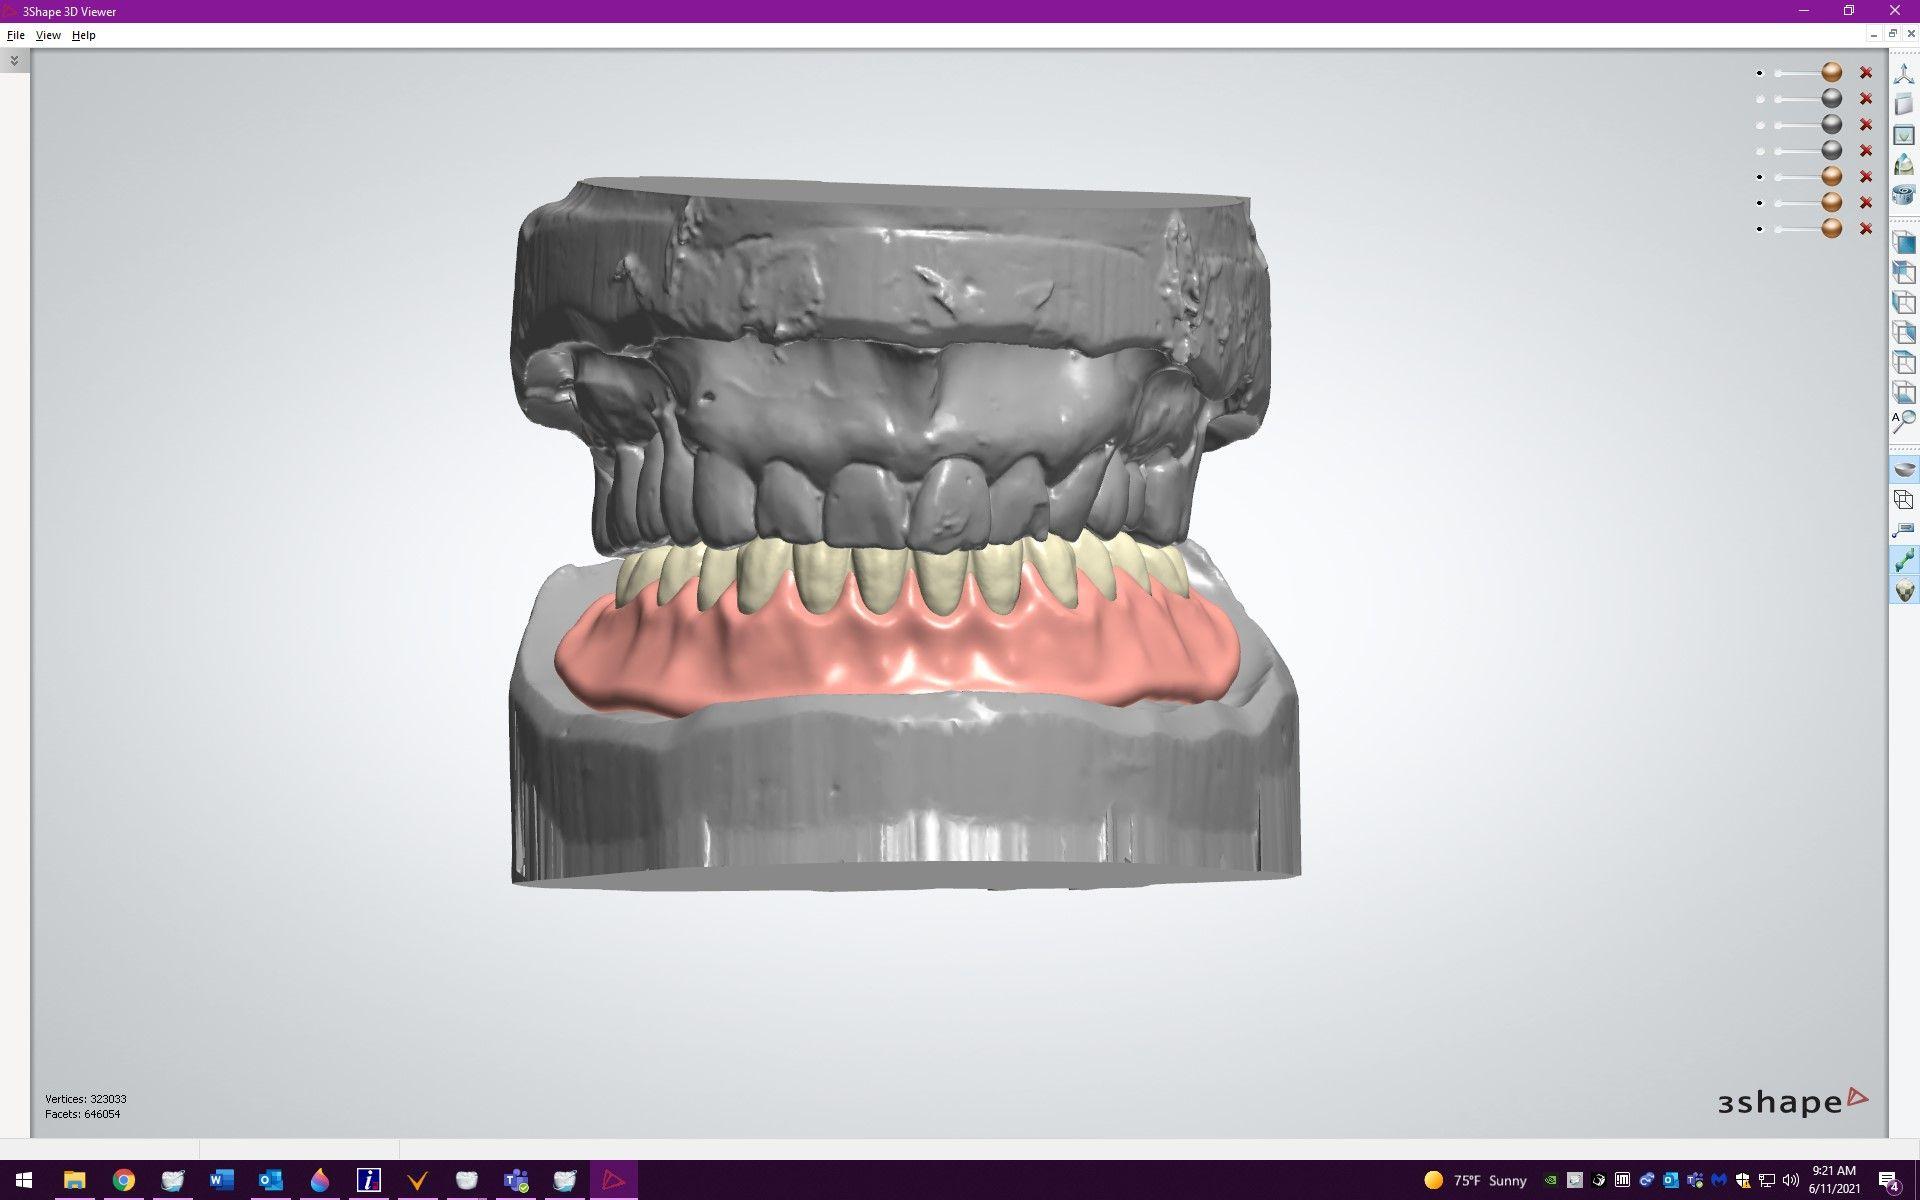 Figure 15. Digital setup for mandibular, cast bar reinforced, overdenture.